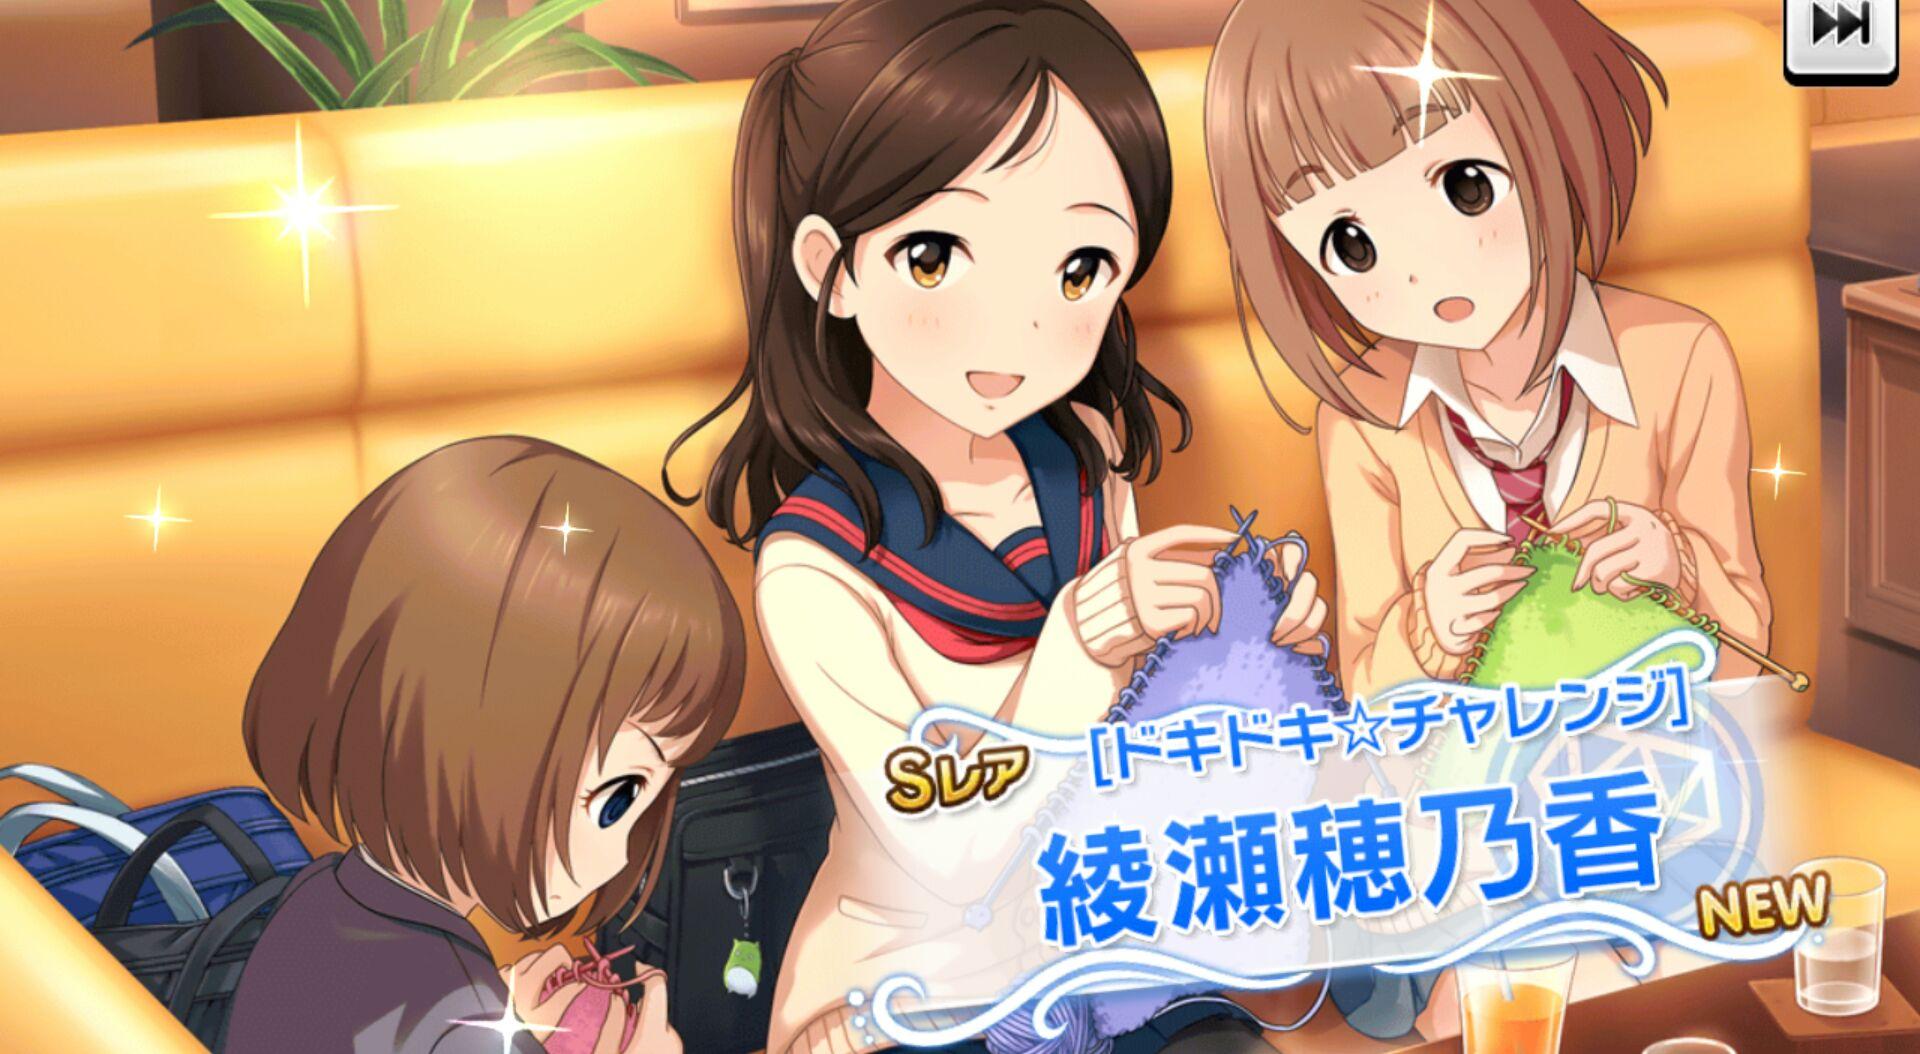 share_2016-08-23-17-53-03.jpg